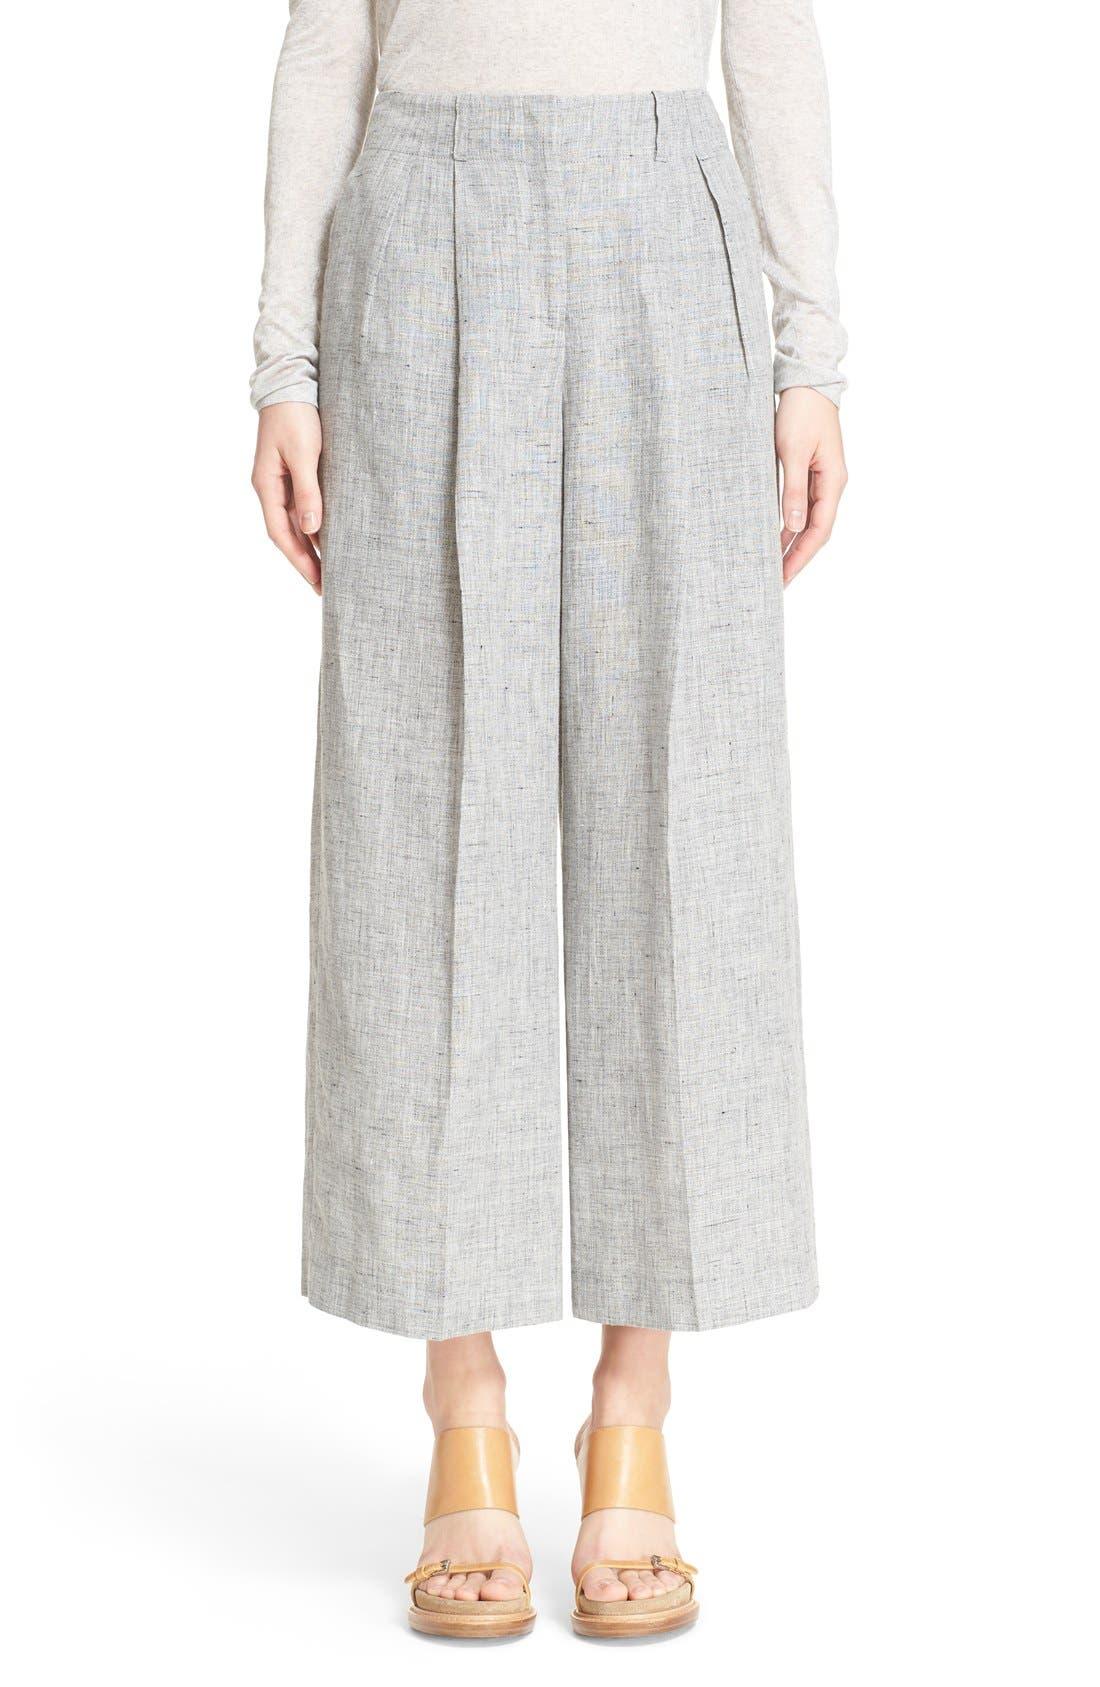 Alternate Image 1 Selected - Michael Kors Pleated Crop Mélange Linen Pants